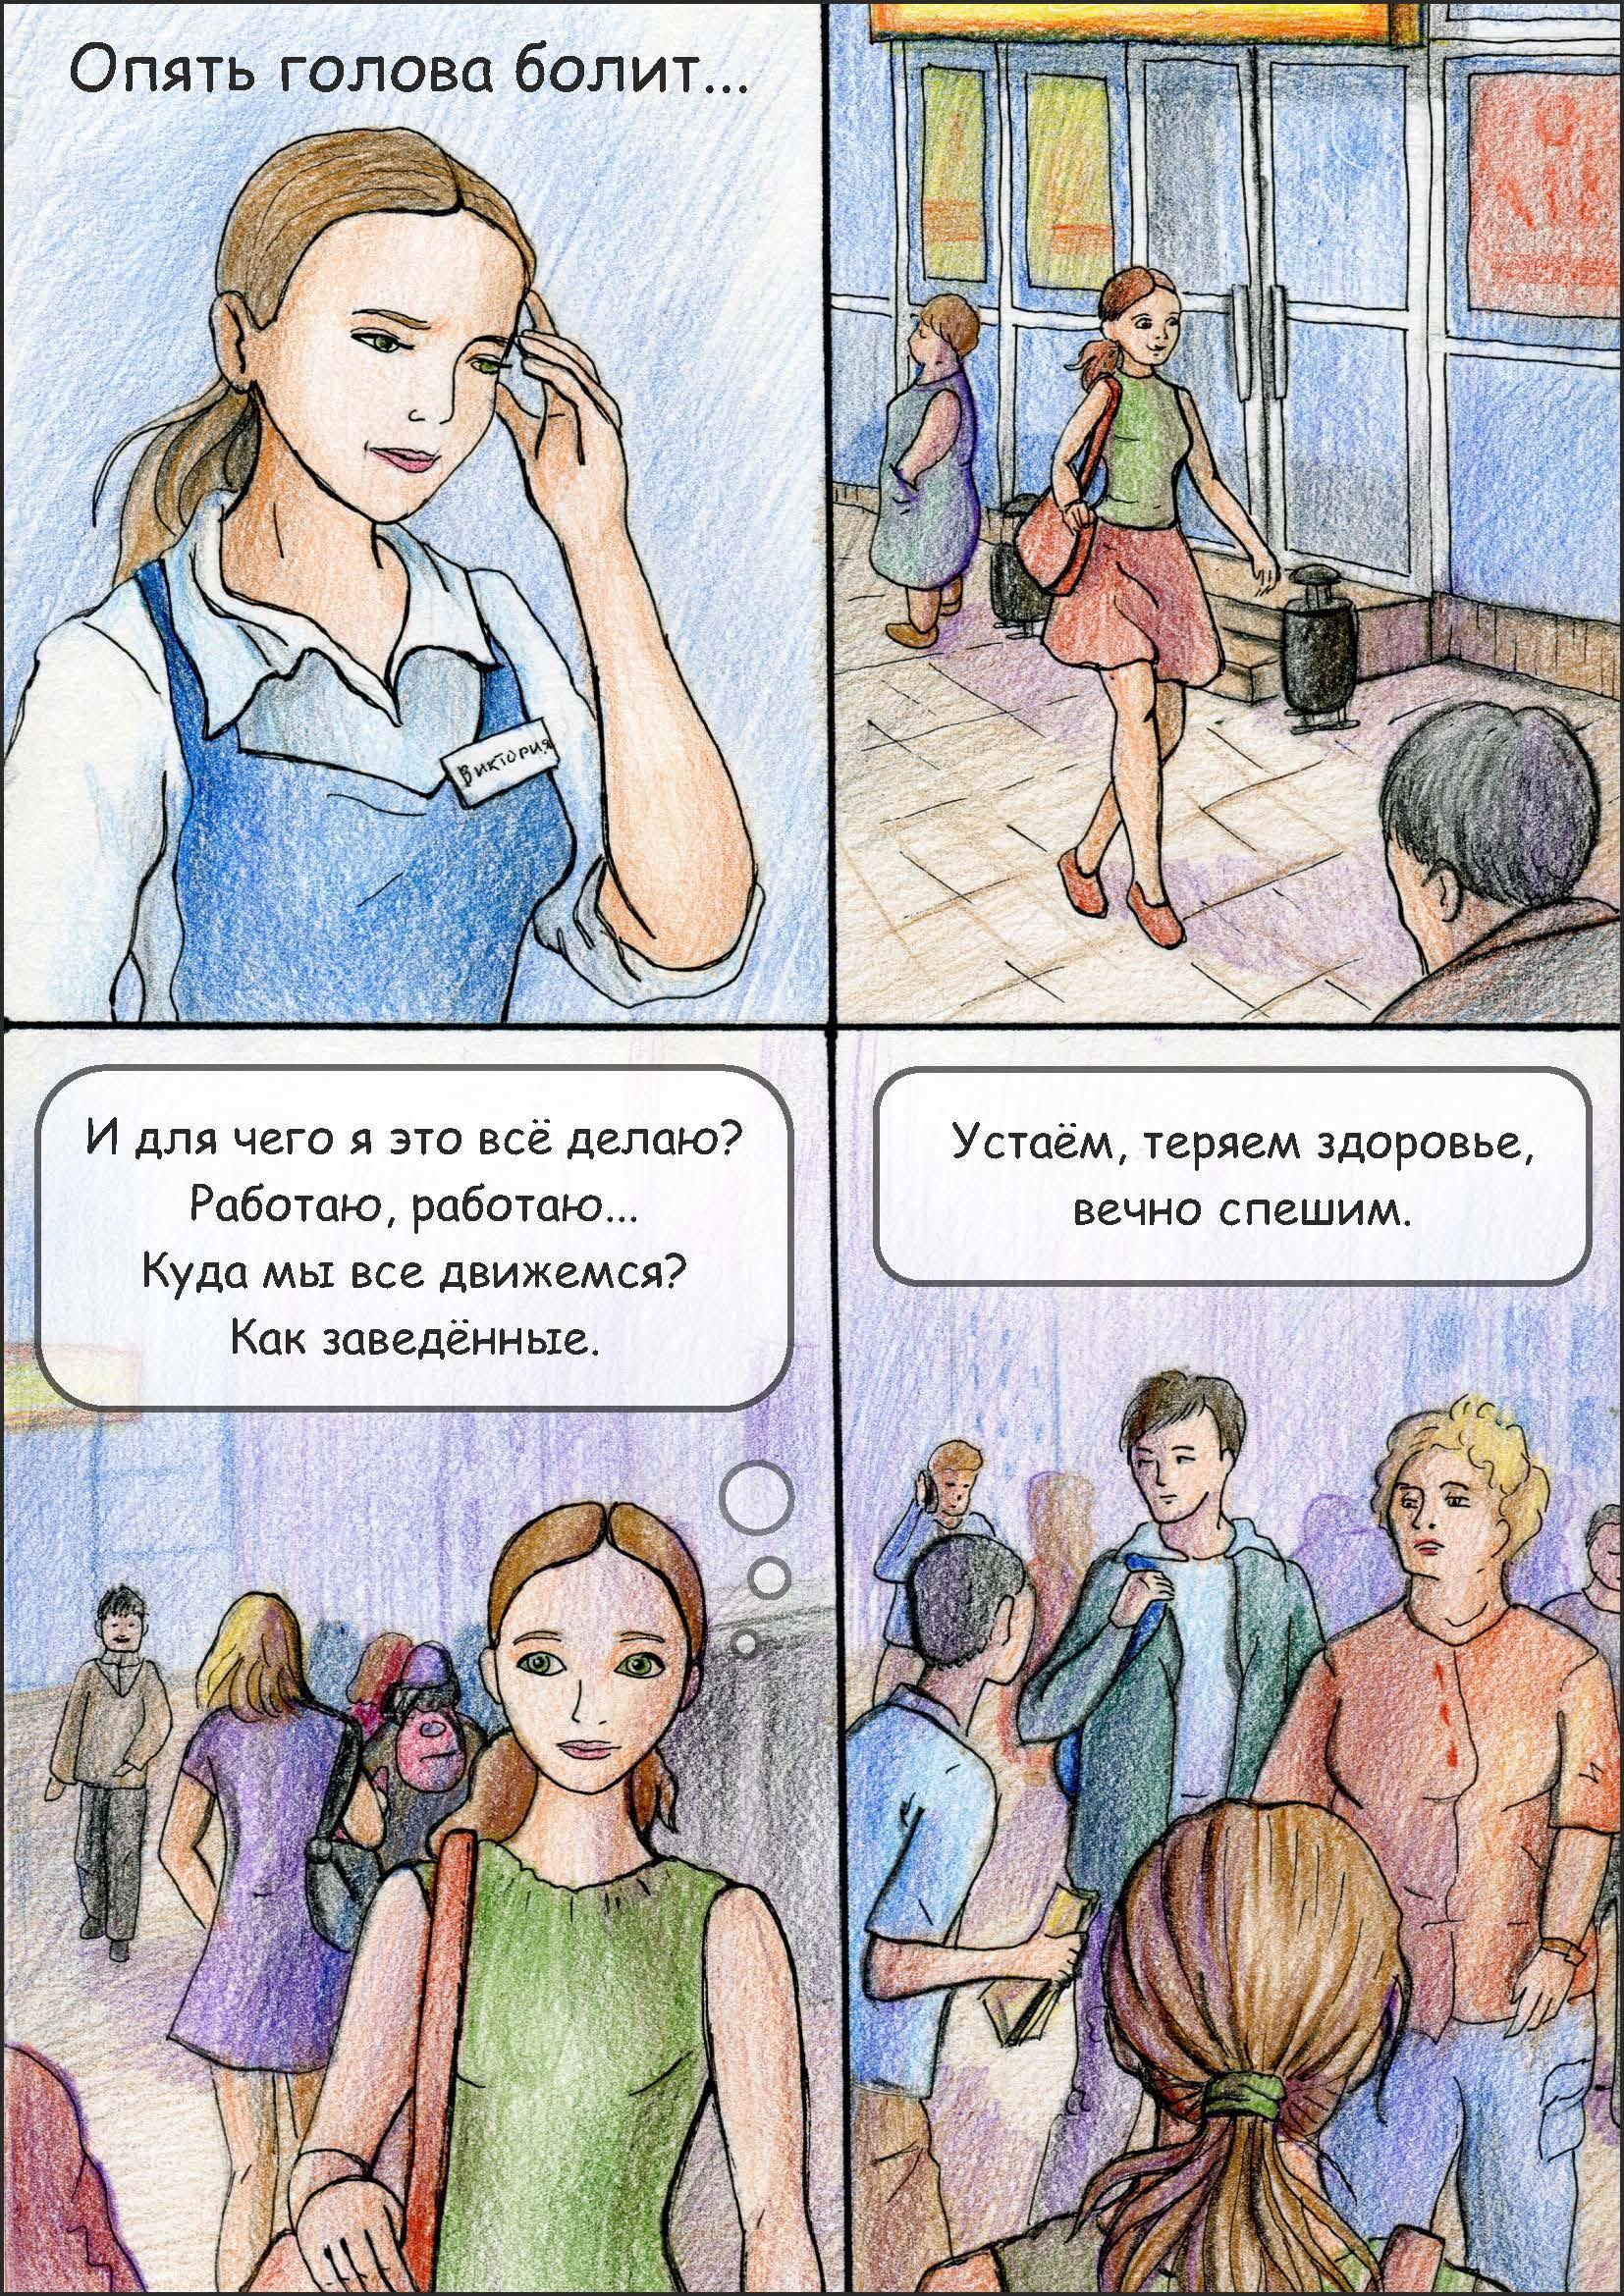 Анна Гейдебрехт. Комикс Зовущая мечта (3).jpg